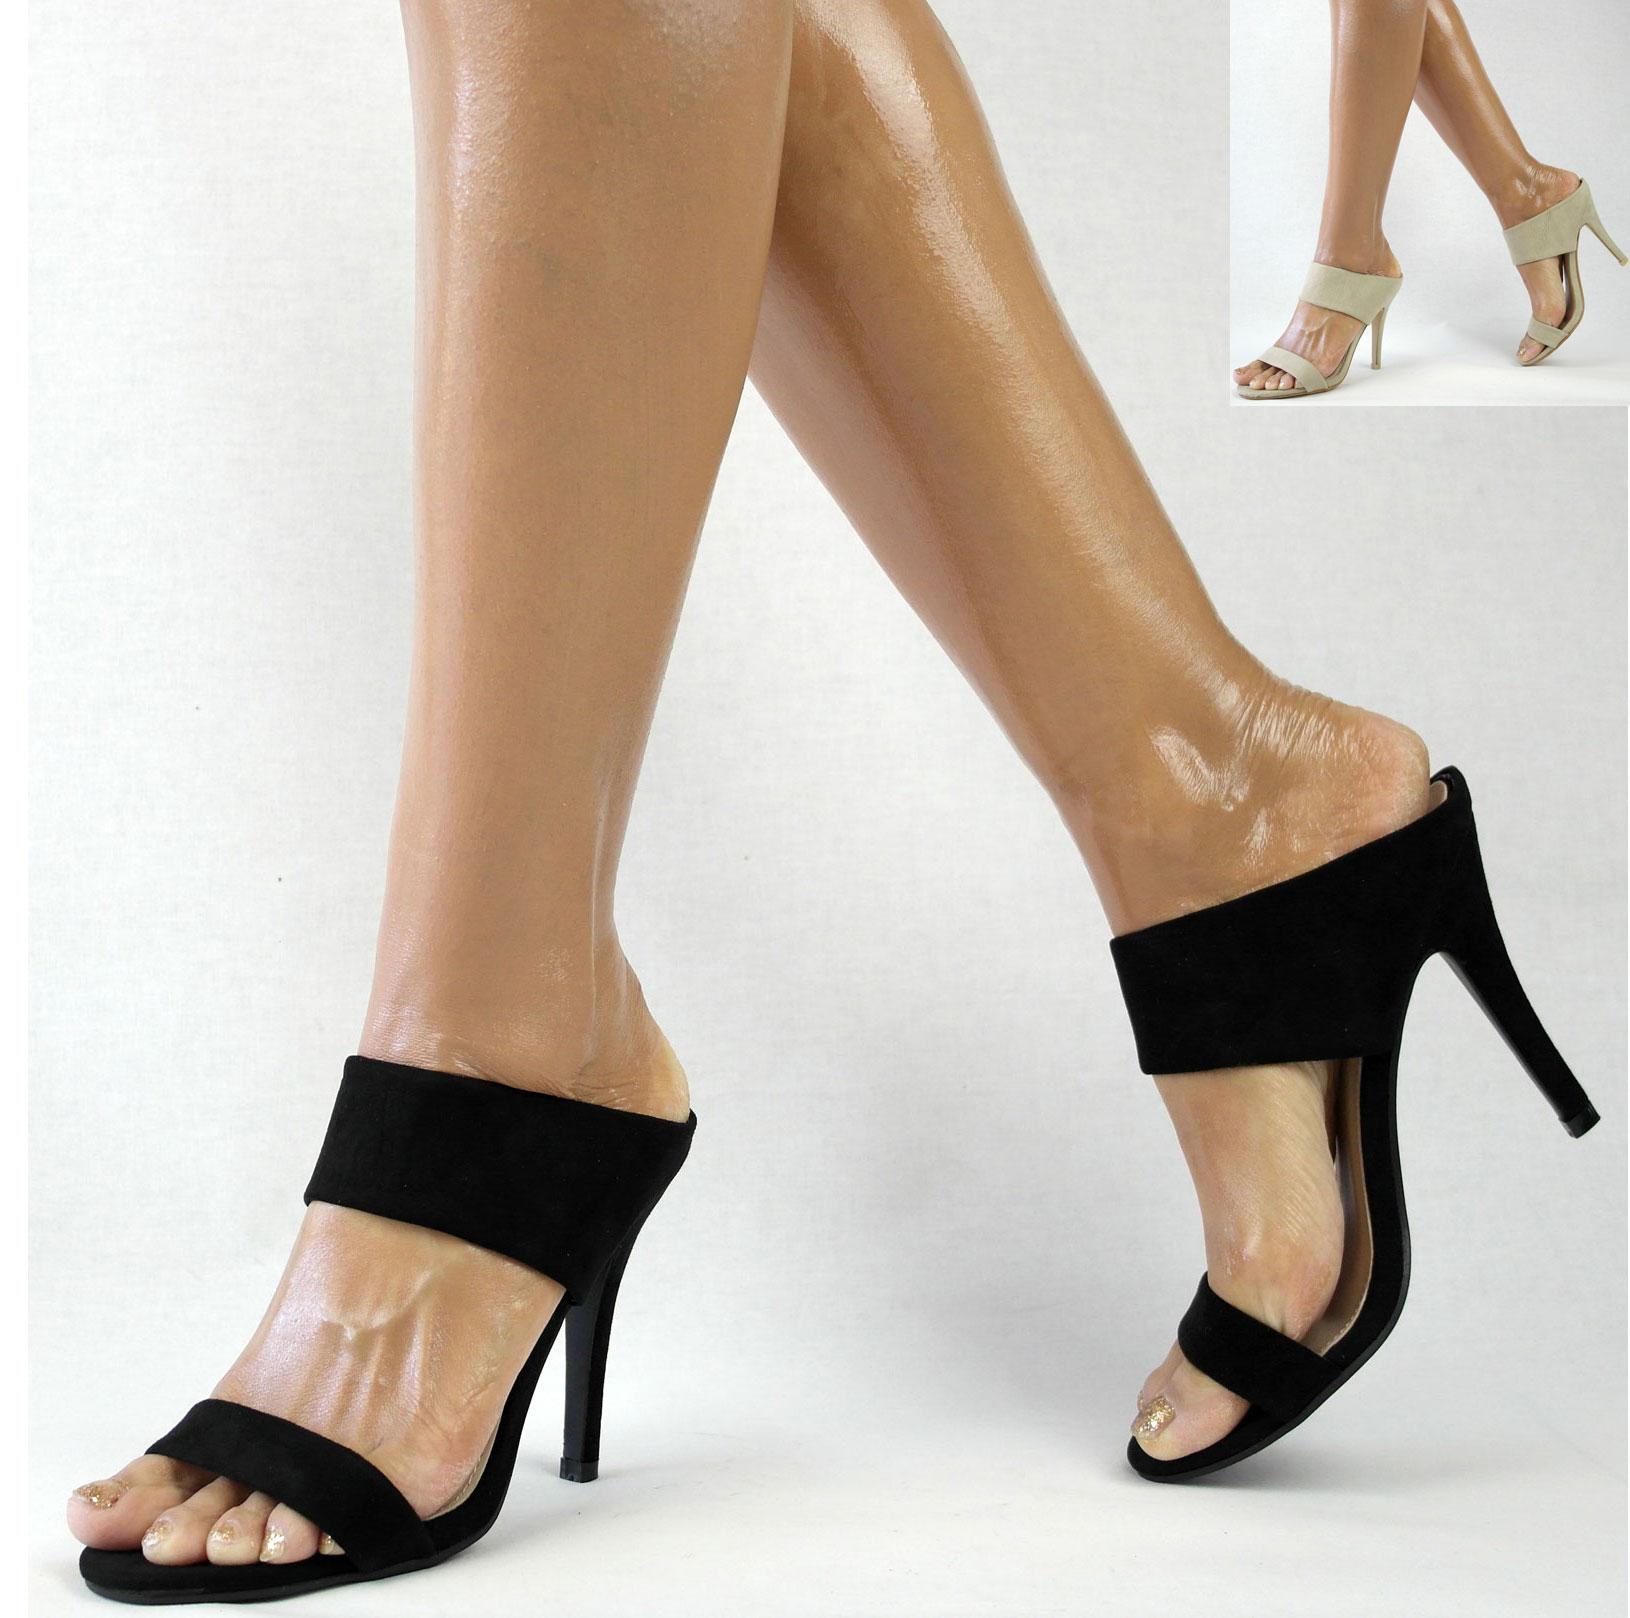 damenschuhe sandalen 36 41 sandaletten high heels stiletto pantoletten. Black Bedroom Furniture Sets. Home Design Ideas